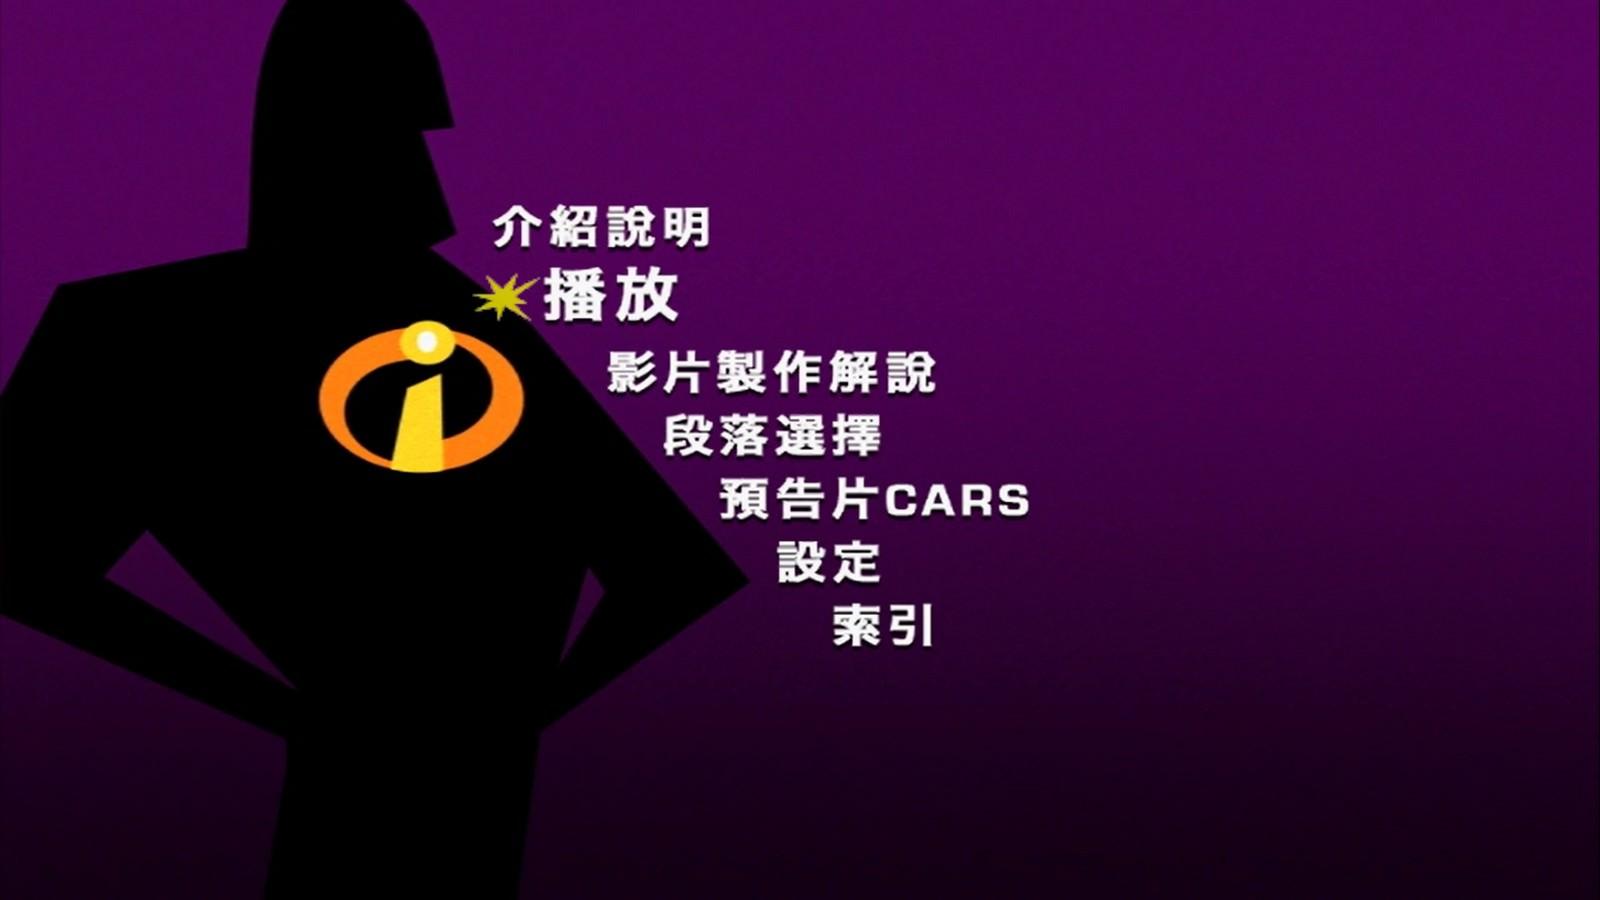 Movie, The Incredibles(美國, 2004) / 超人特攻隊(台) / 超人总动员(中) / 超人特工隊(港), 電影DVD, 額外收錄